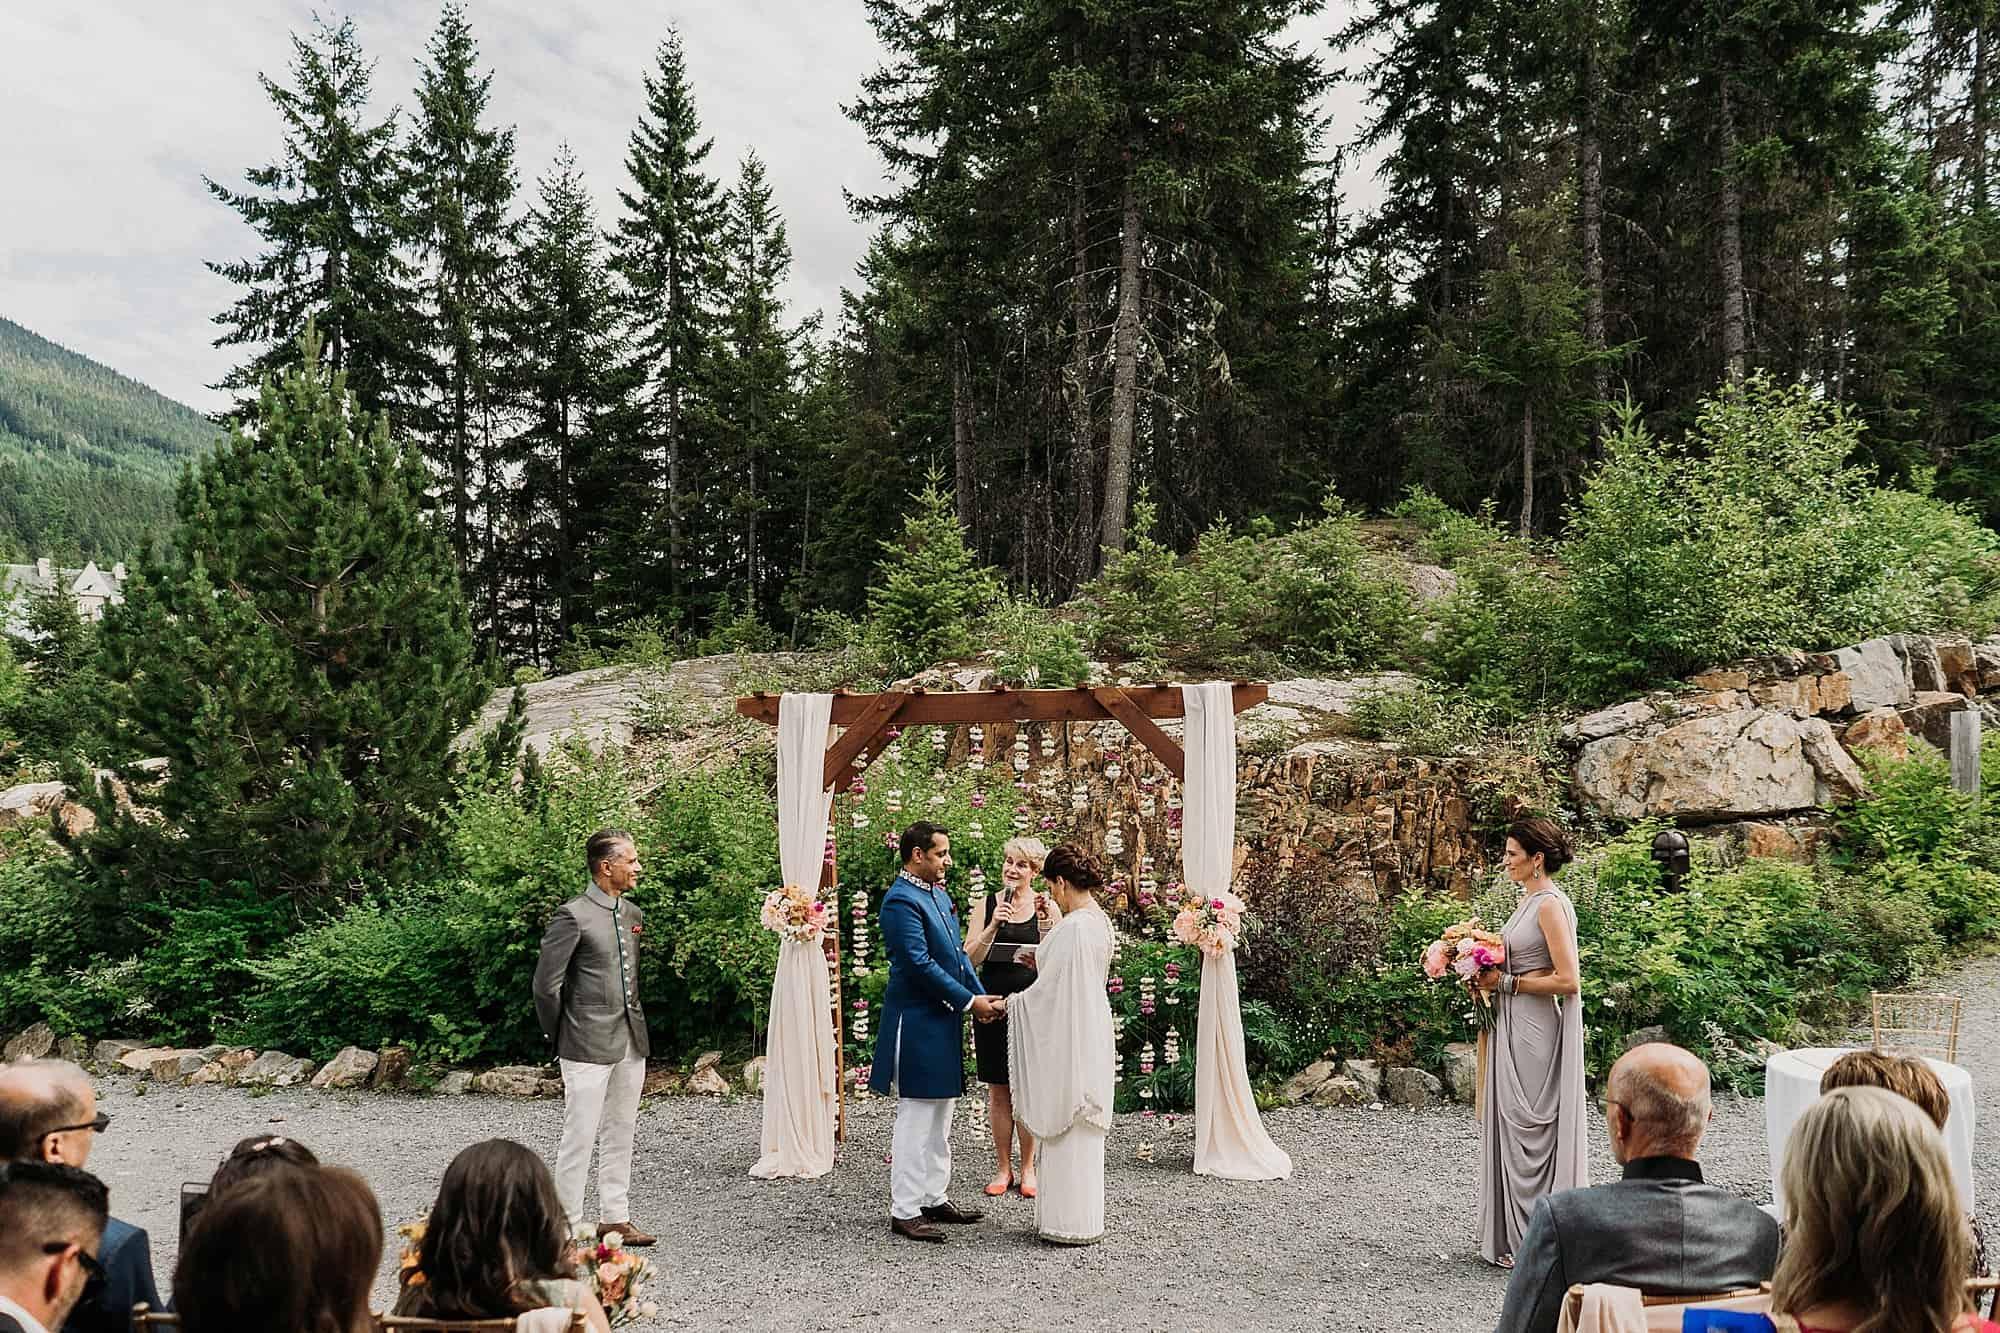 mezzanine level of Squamish lilwat cultural centre wedding